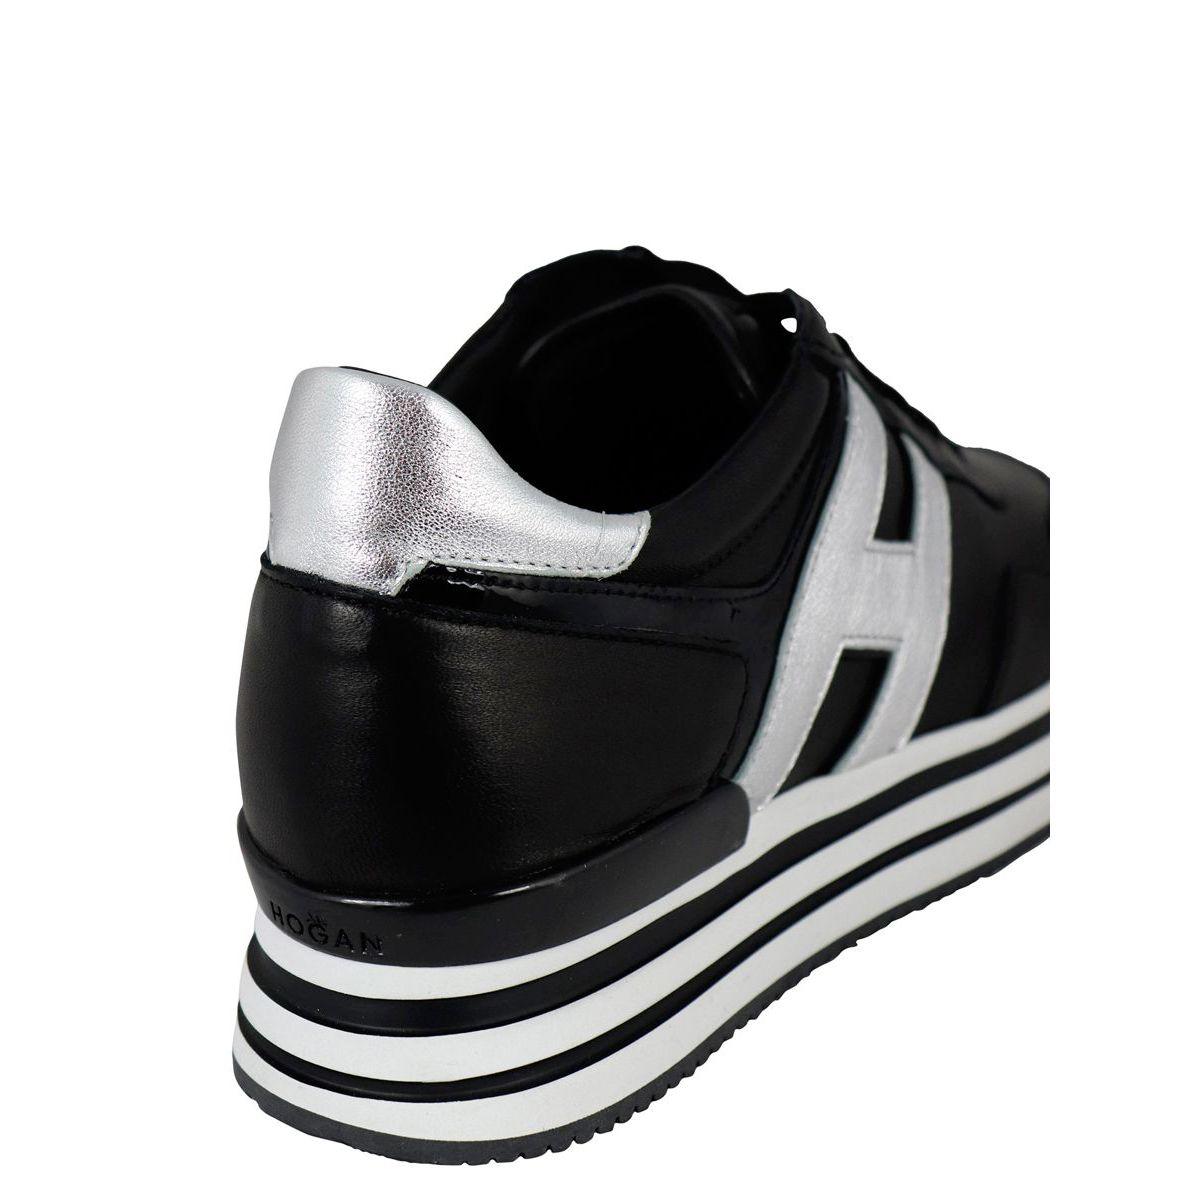 neakers FONDO 483 Black / silver Hogan